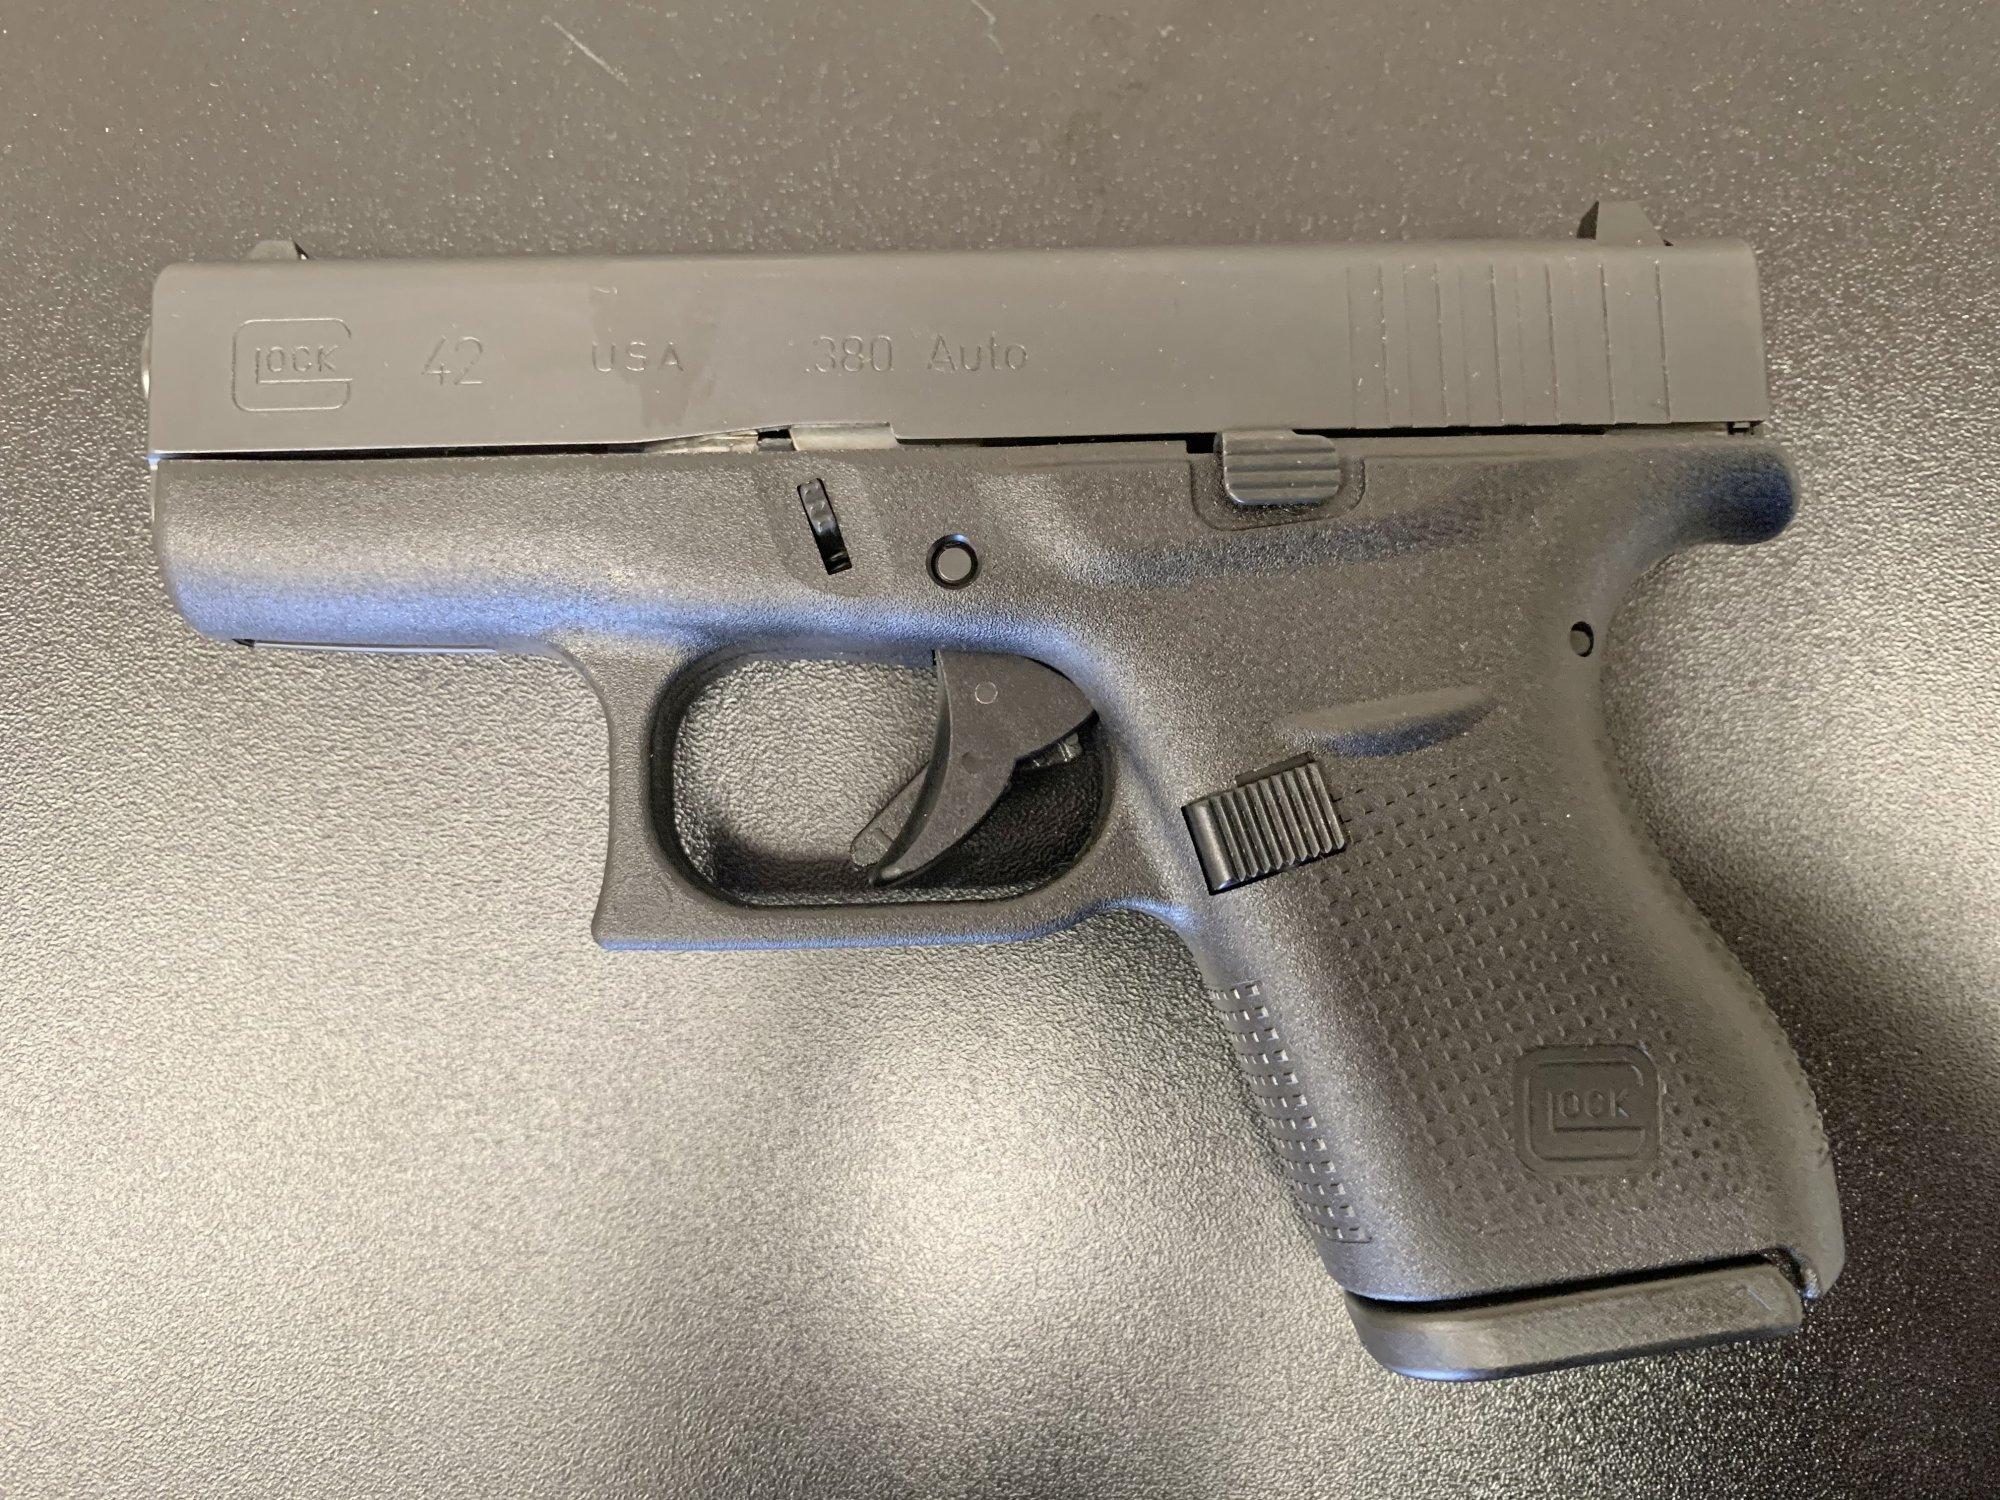 Glock 42 Semi Automatic Pistol - 380